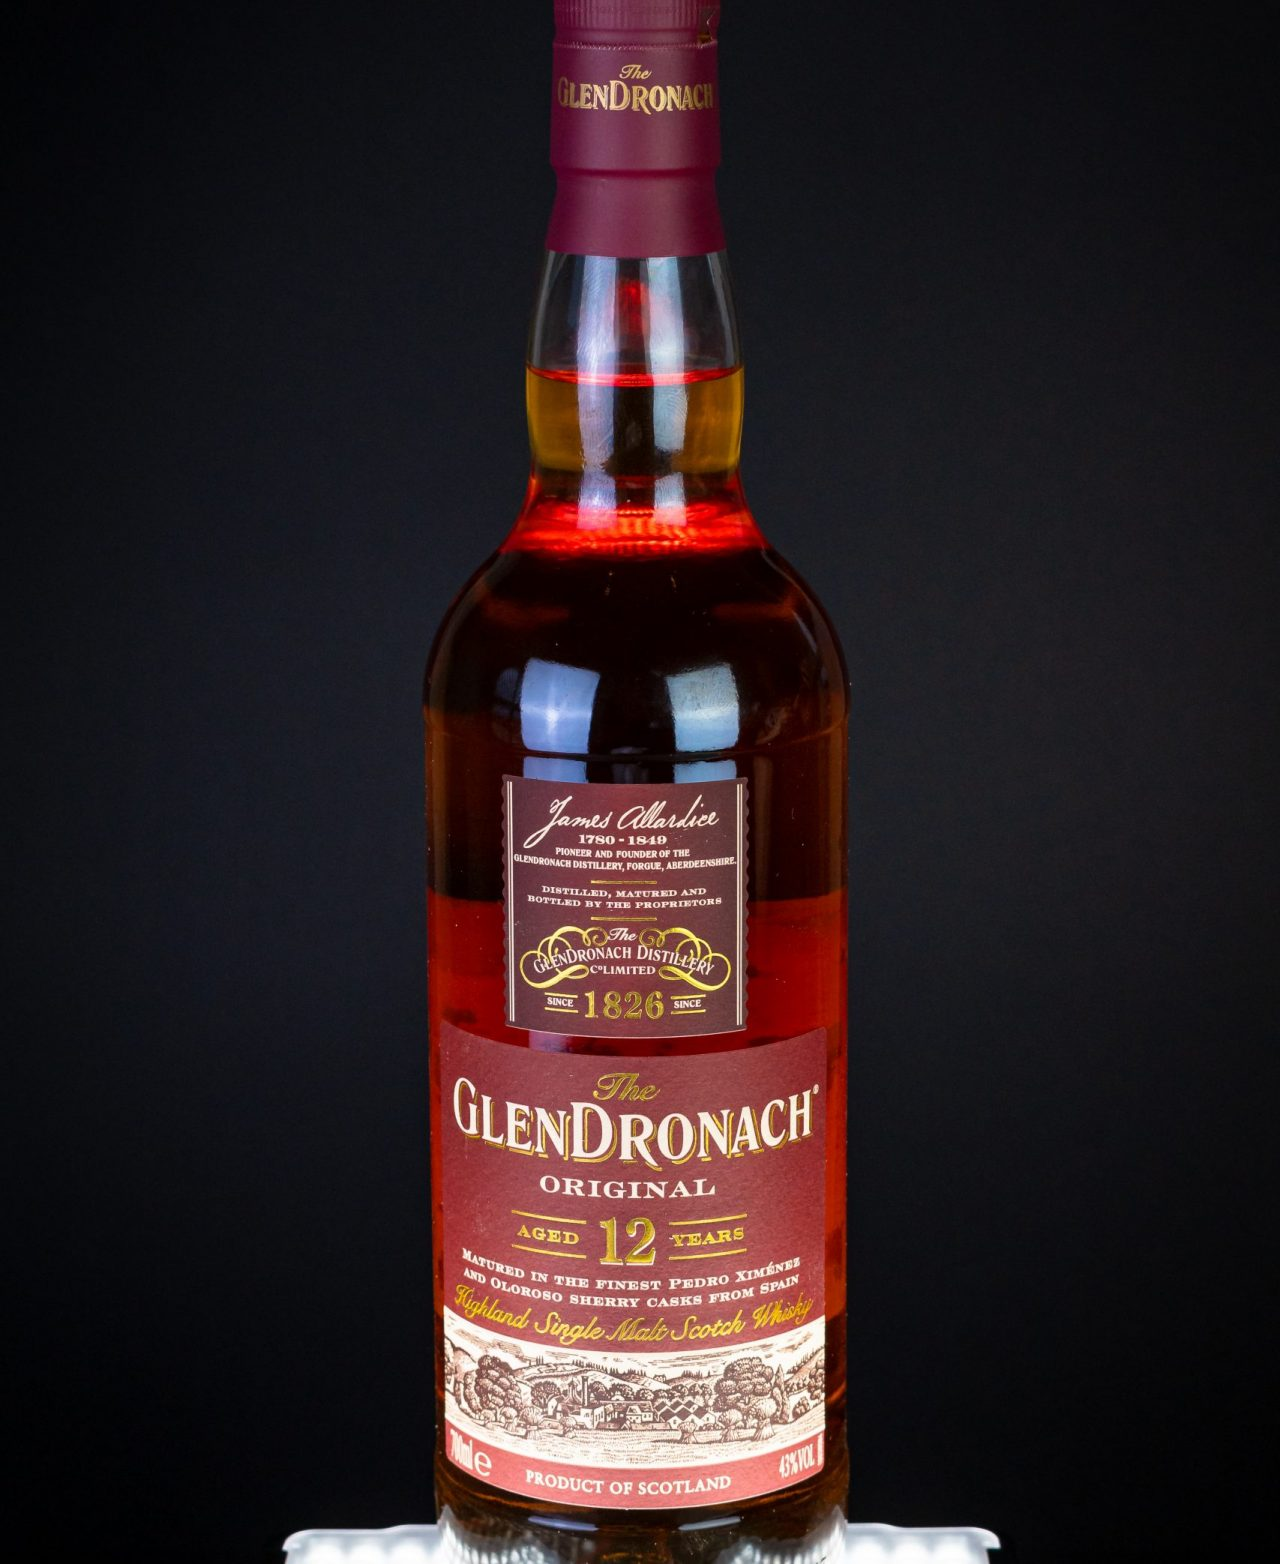 GlenDronach Original 5cl